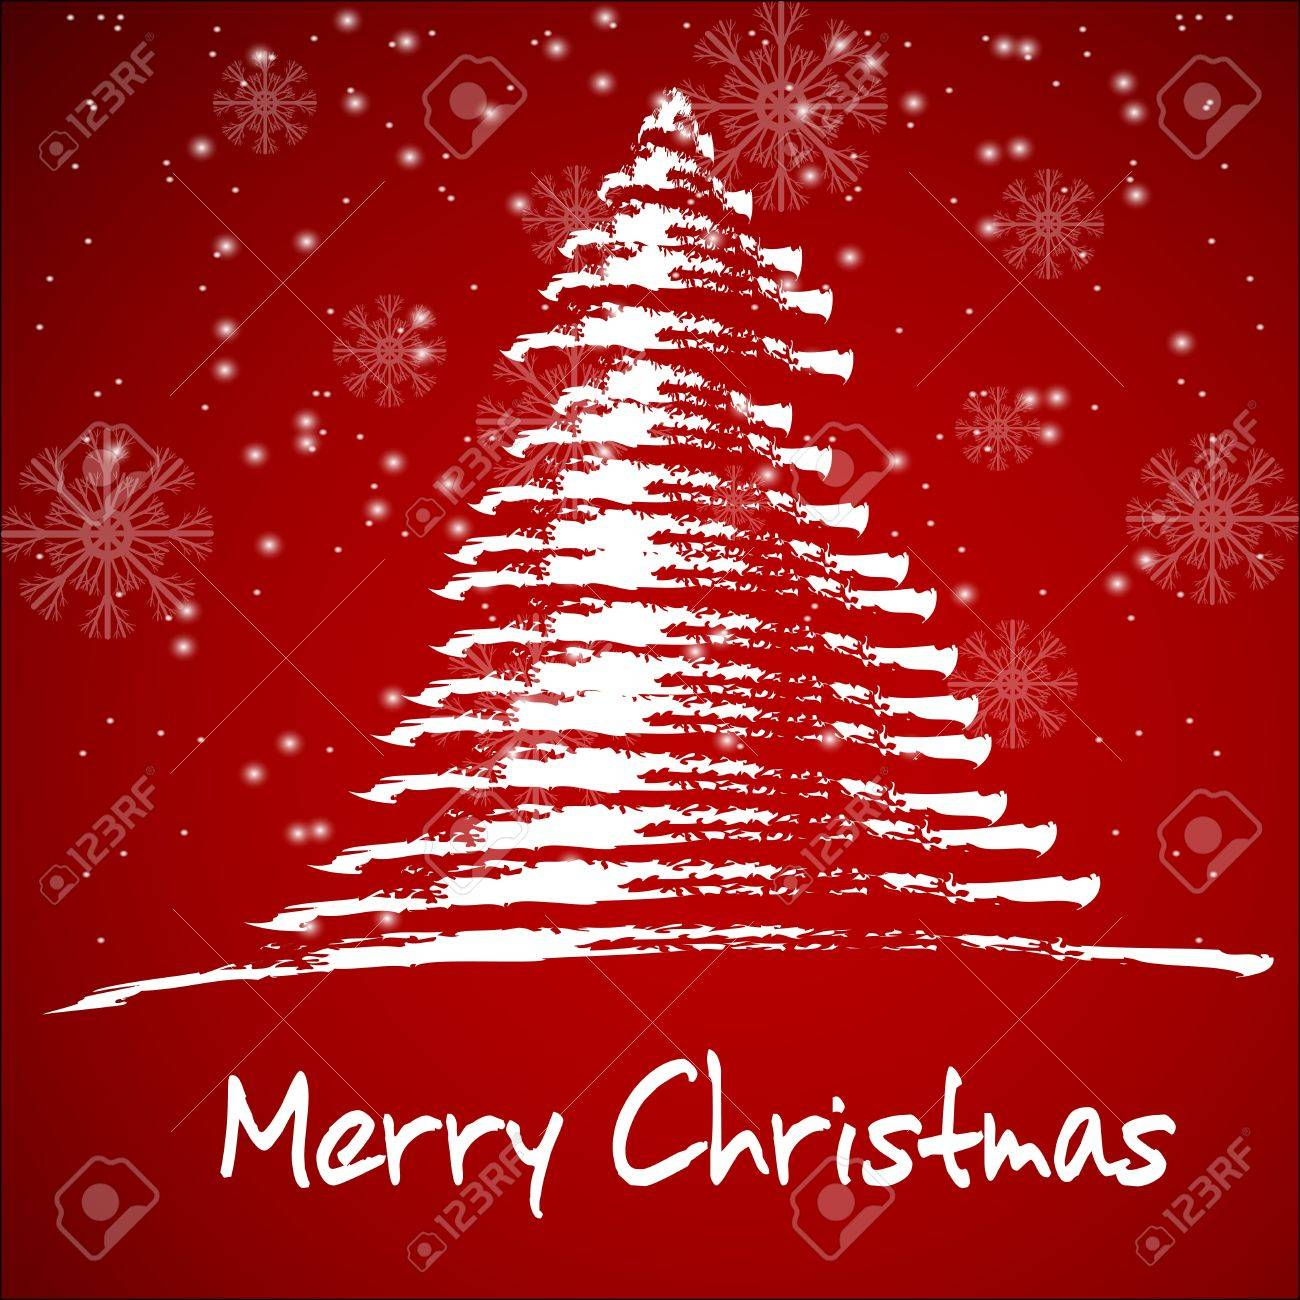 Christmas background with stylized christmas tree EPS10 - 15936696